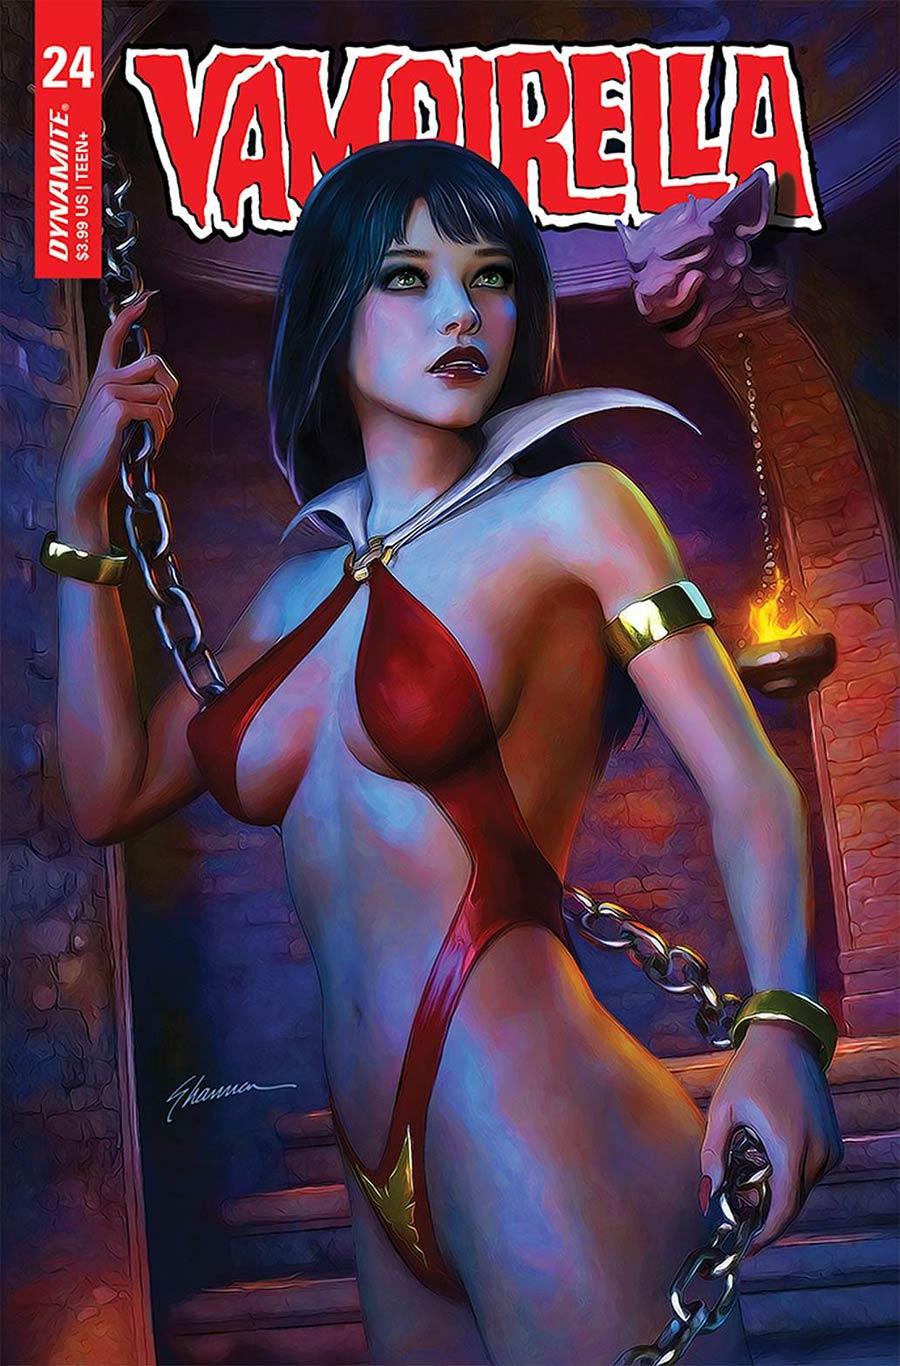 Vampirella Vol 8 #24 Cover C Variant Shannon Maer Cover